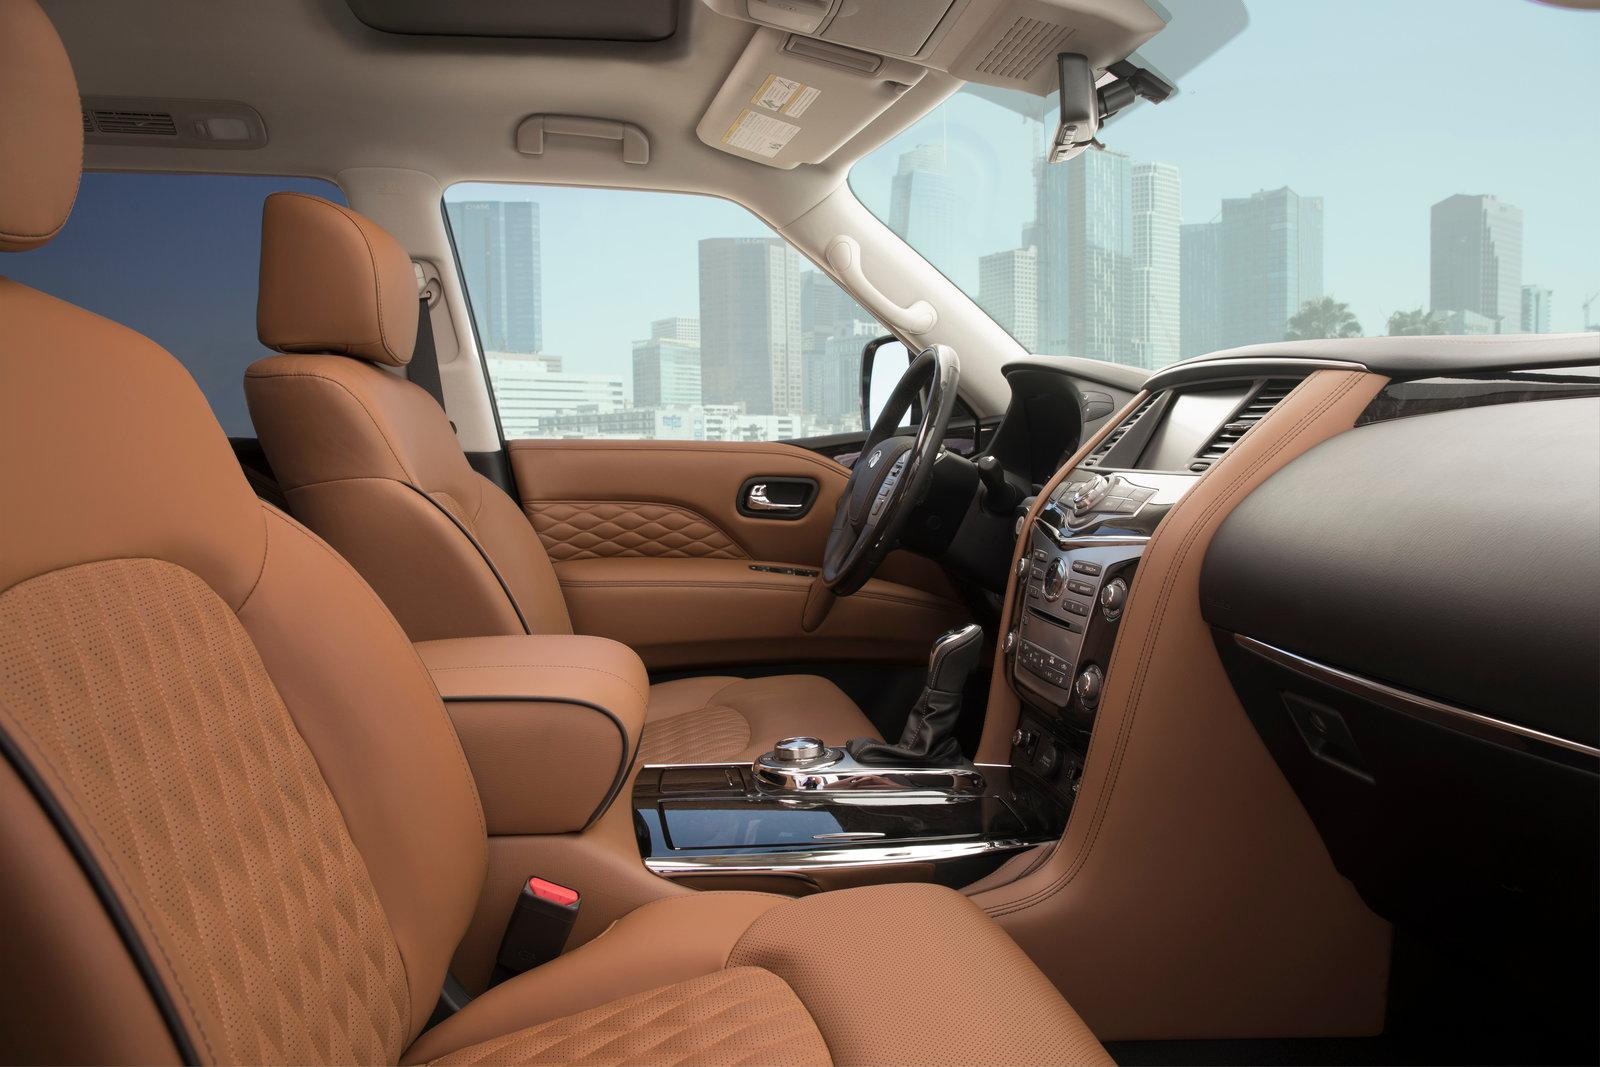 Updated 2018 Infiniti QX80 starts at $65,745 - CarsDirect